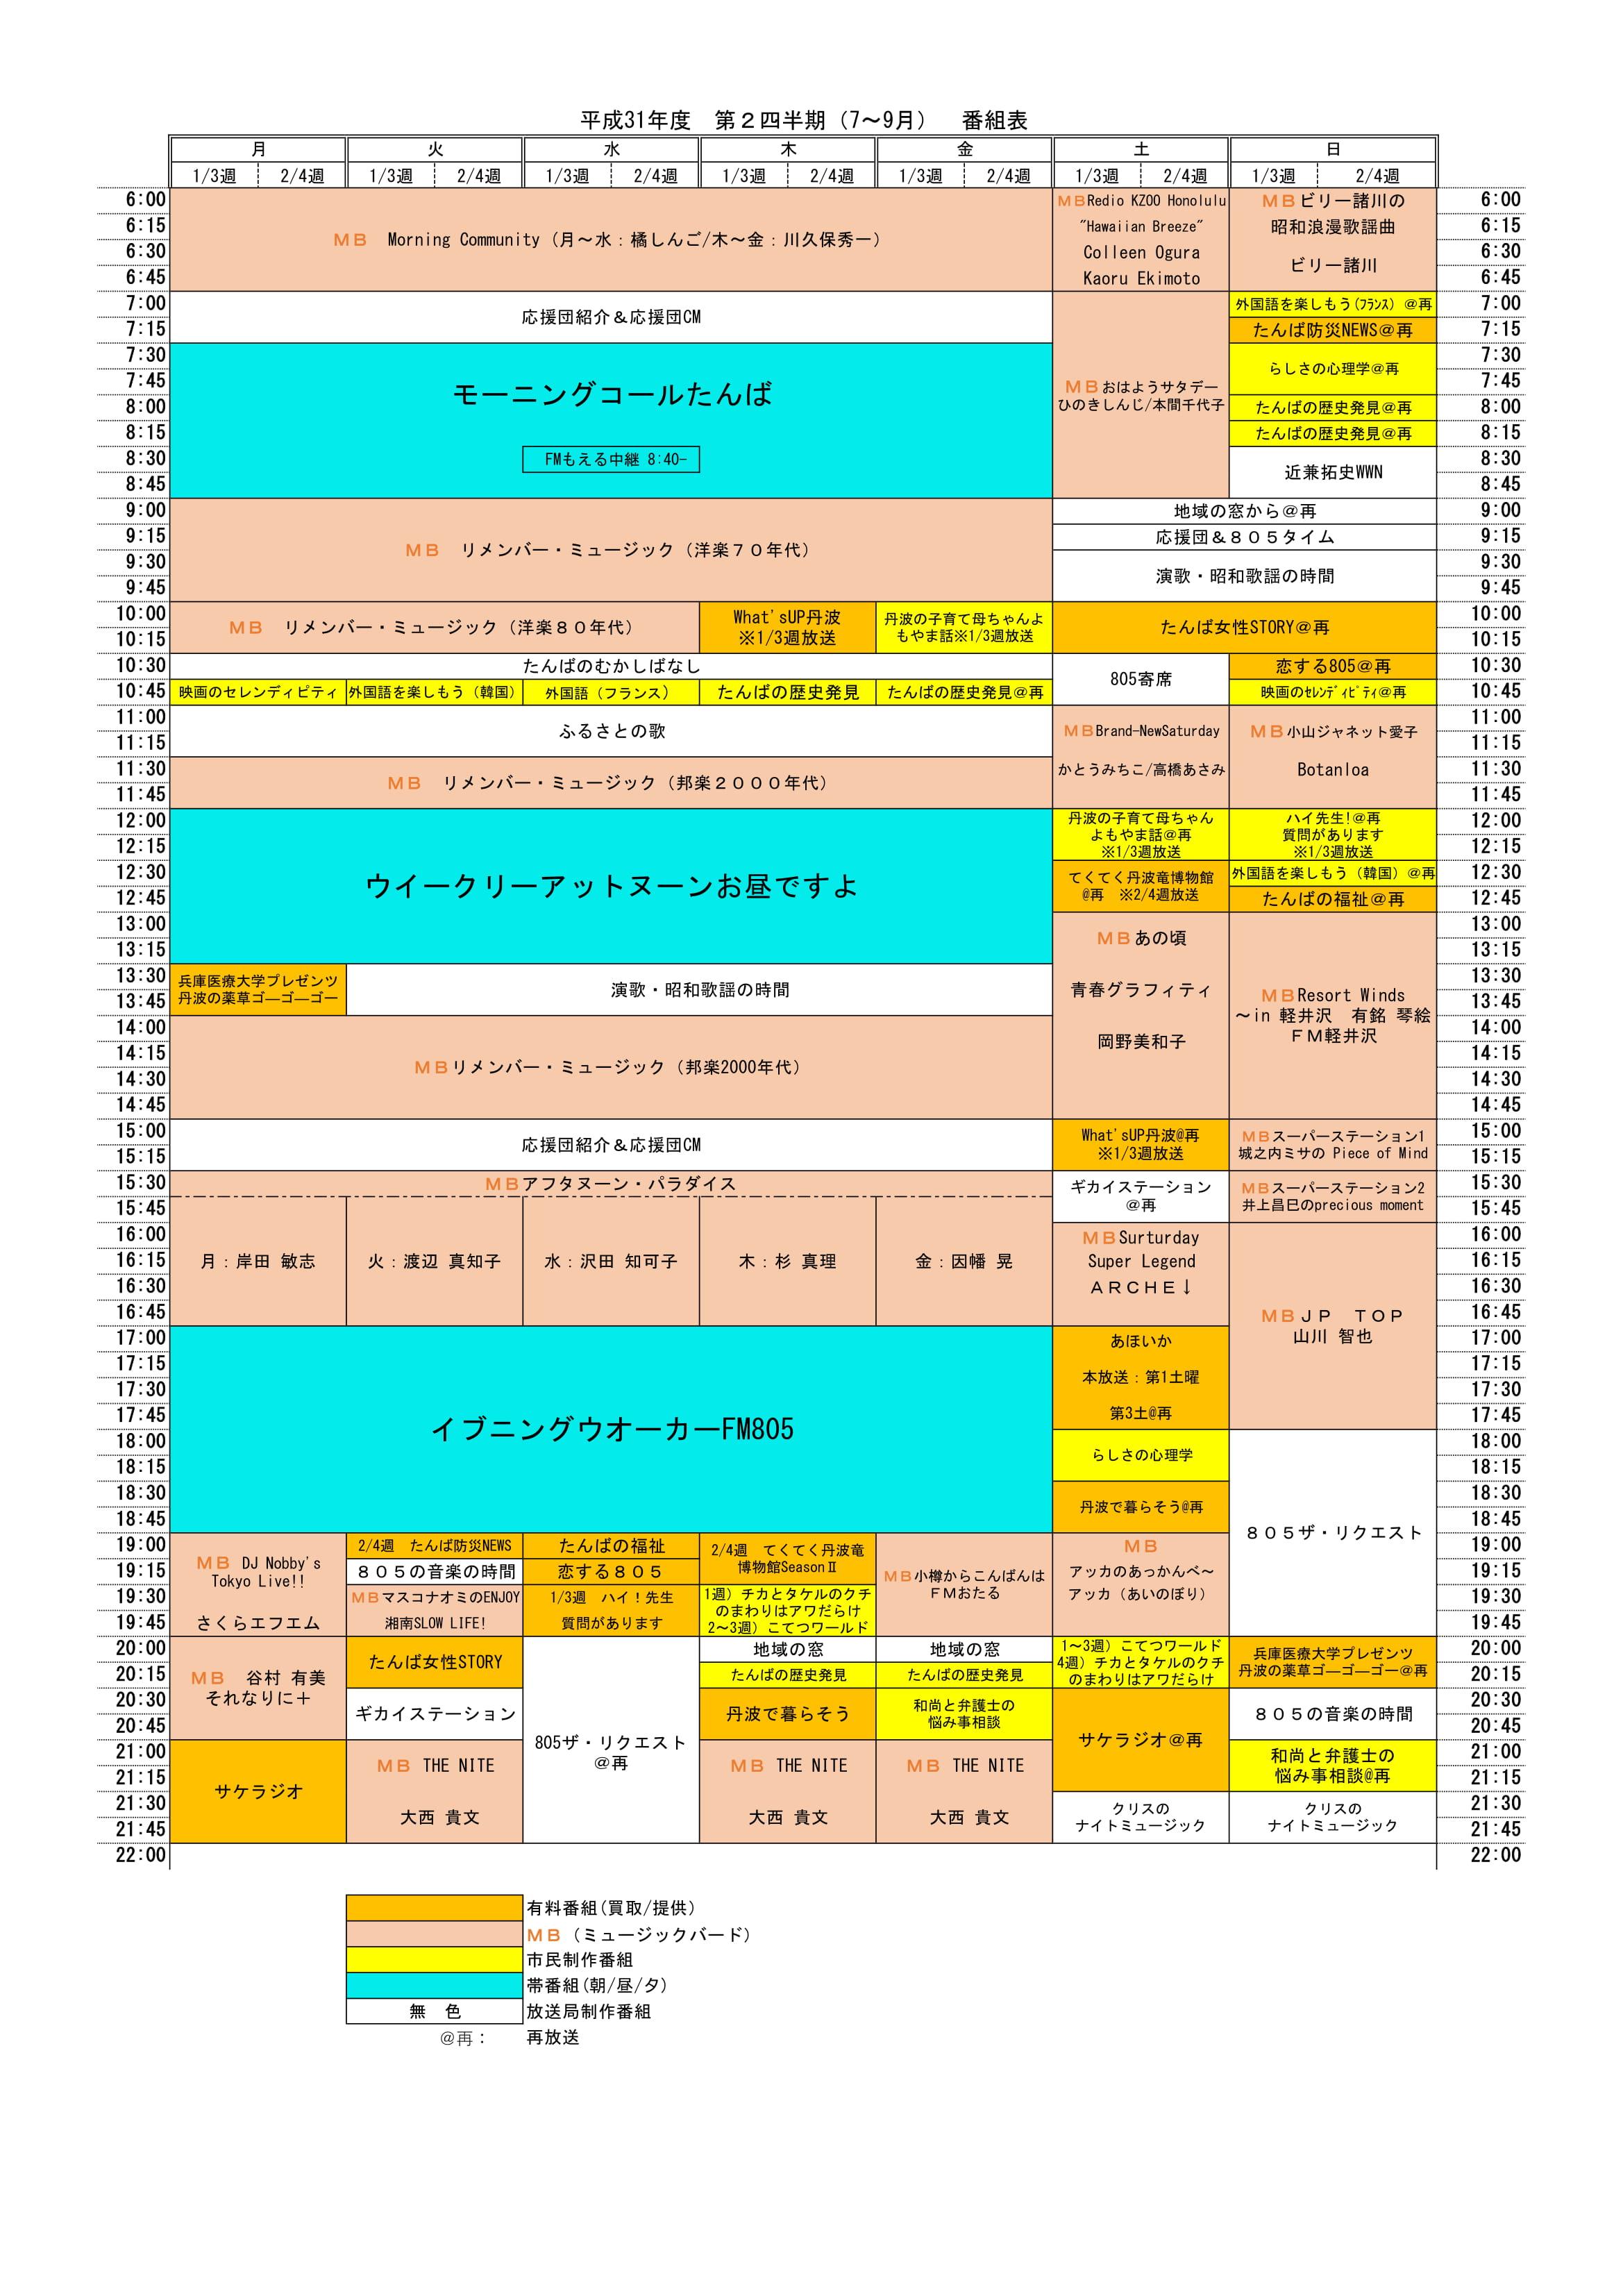 Nhk 番組 表 fm